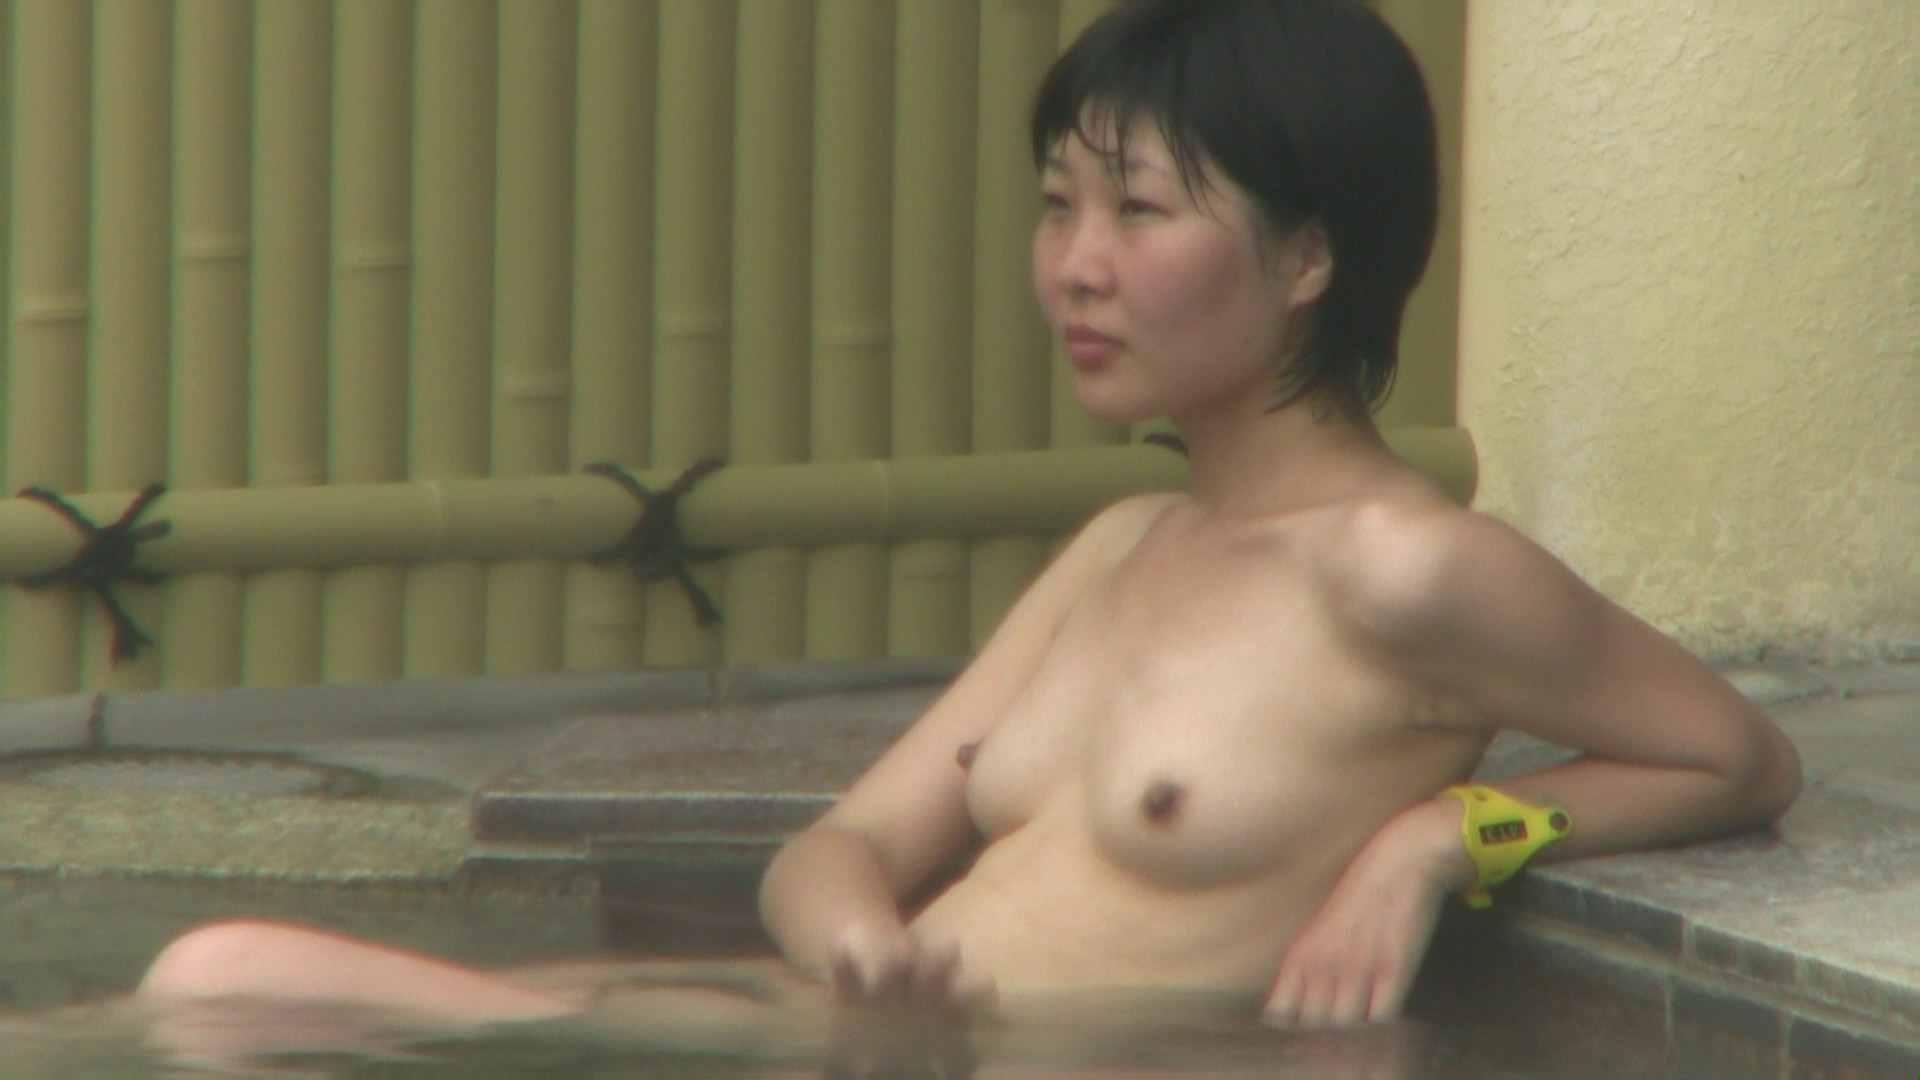 Aquaな露天風呂Vol.74【VIP限定】 露天風呂編 | 盗撮シリーズ  103PIX 25